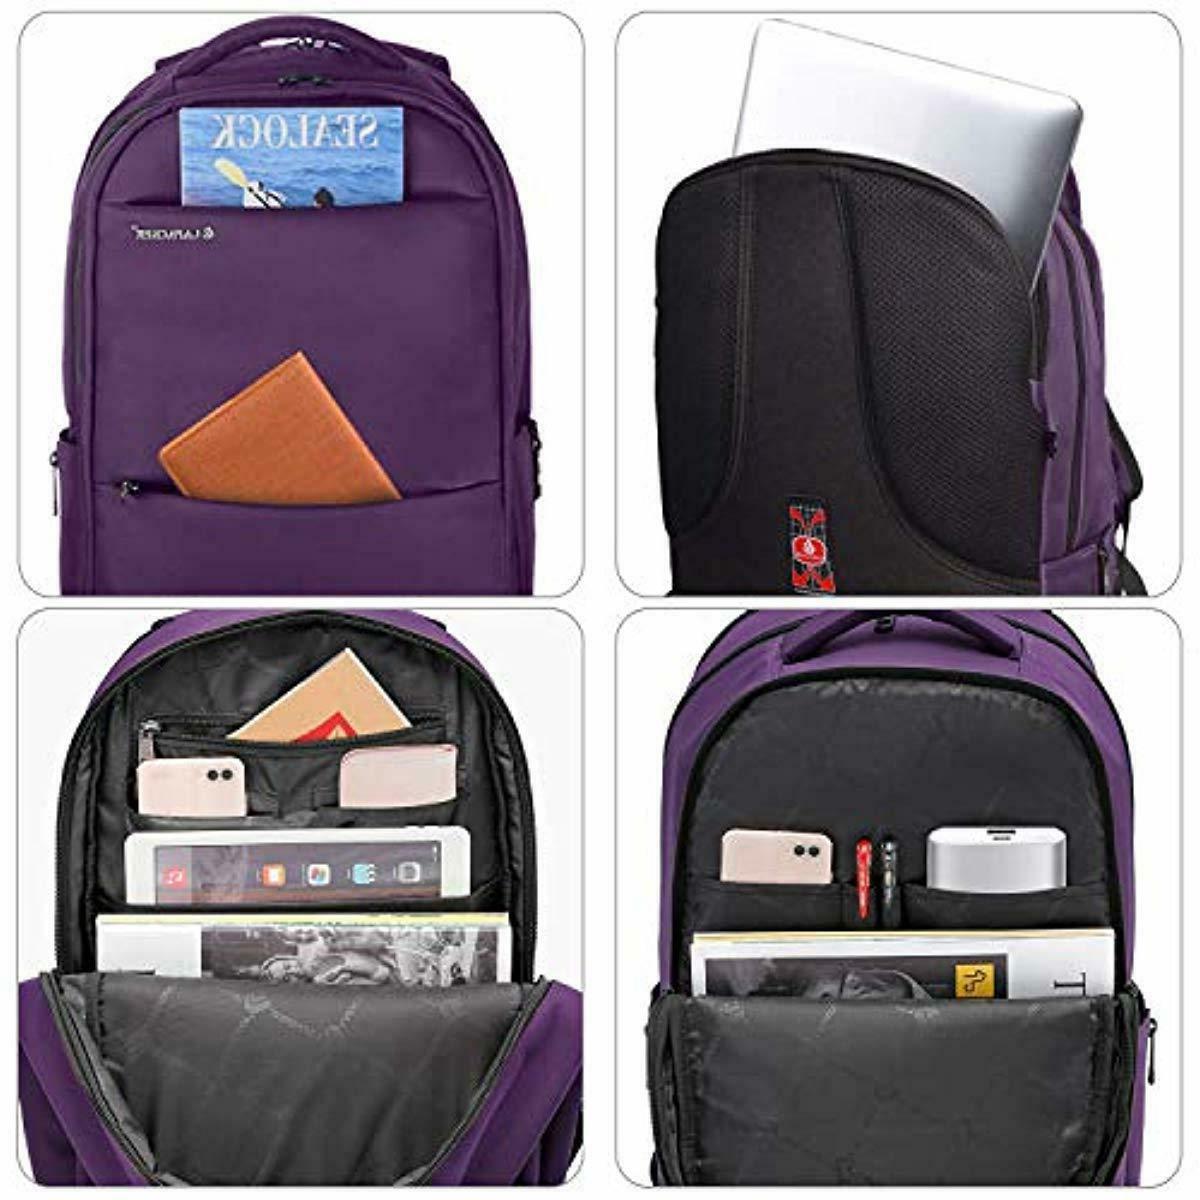 LAPACKER 15.6-17 inch Laptop Backpacks for Women Mens Water Resistant